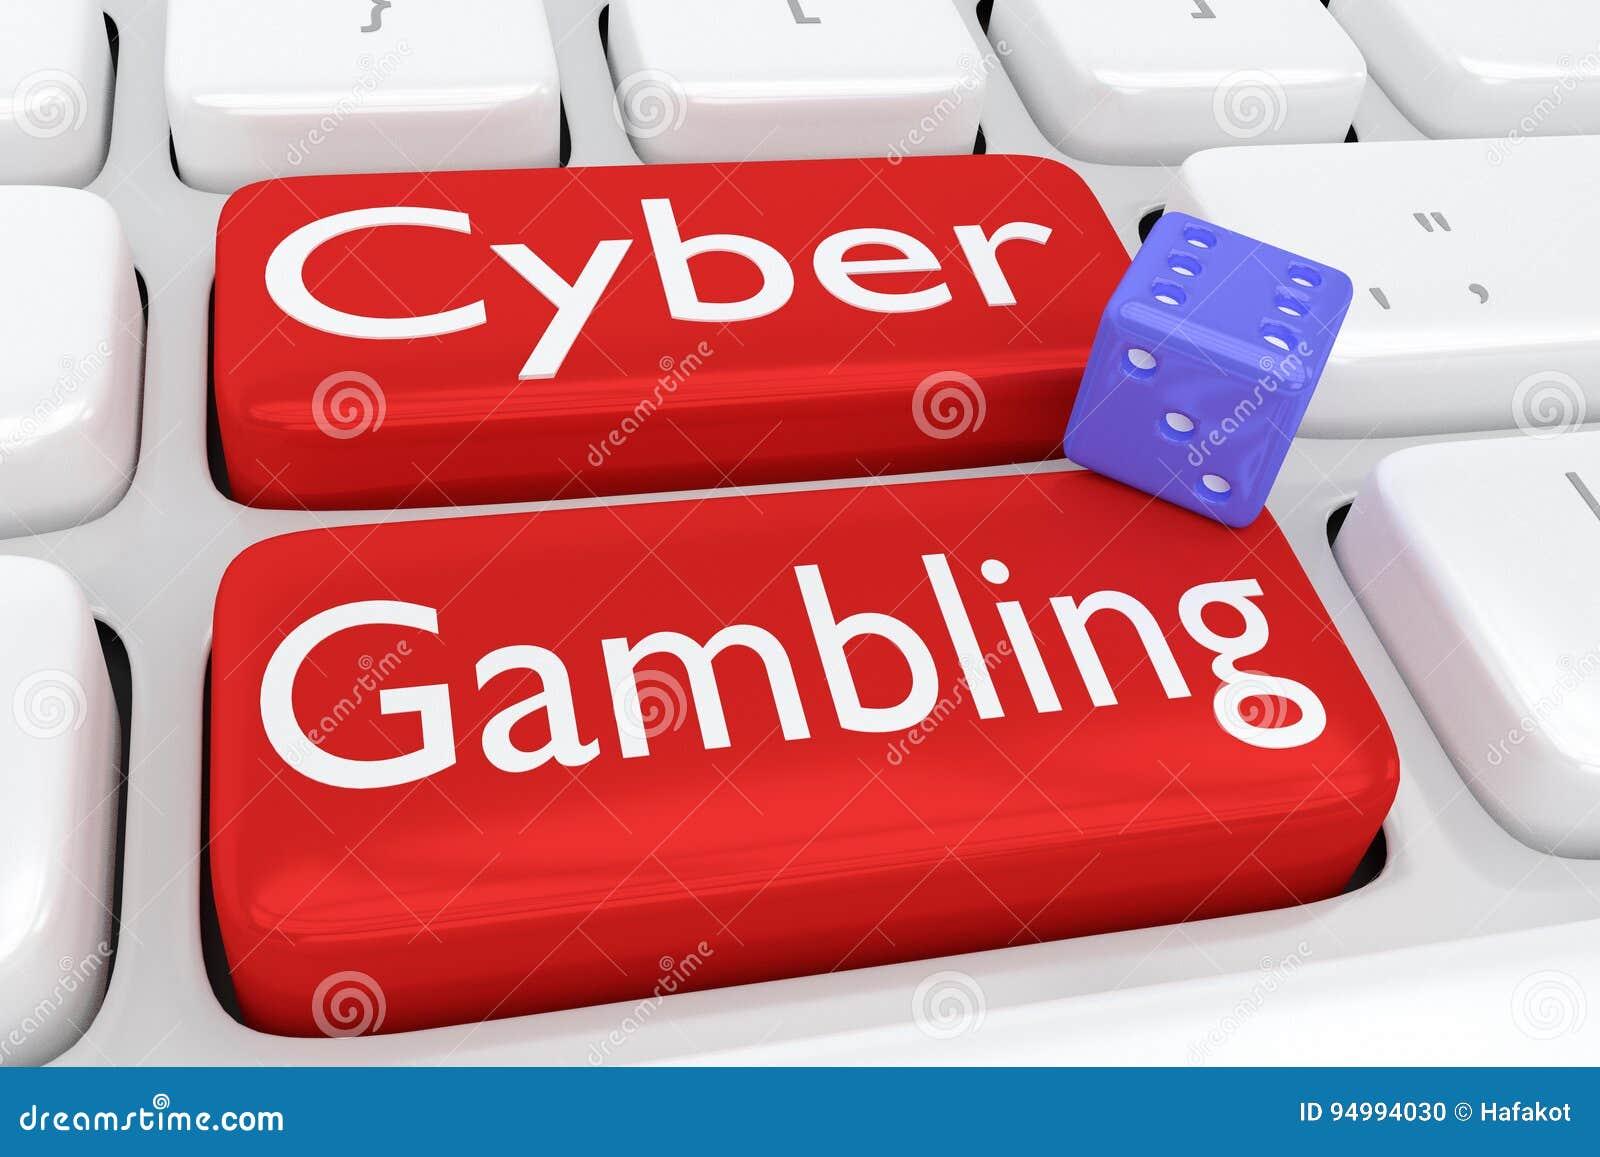 Cyber gambling concept stock illustration. Illustration of online.